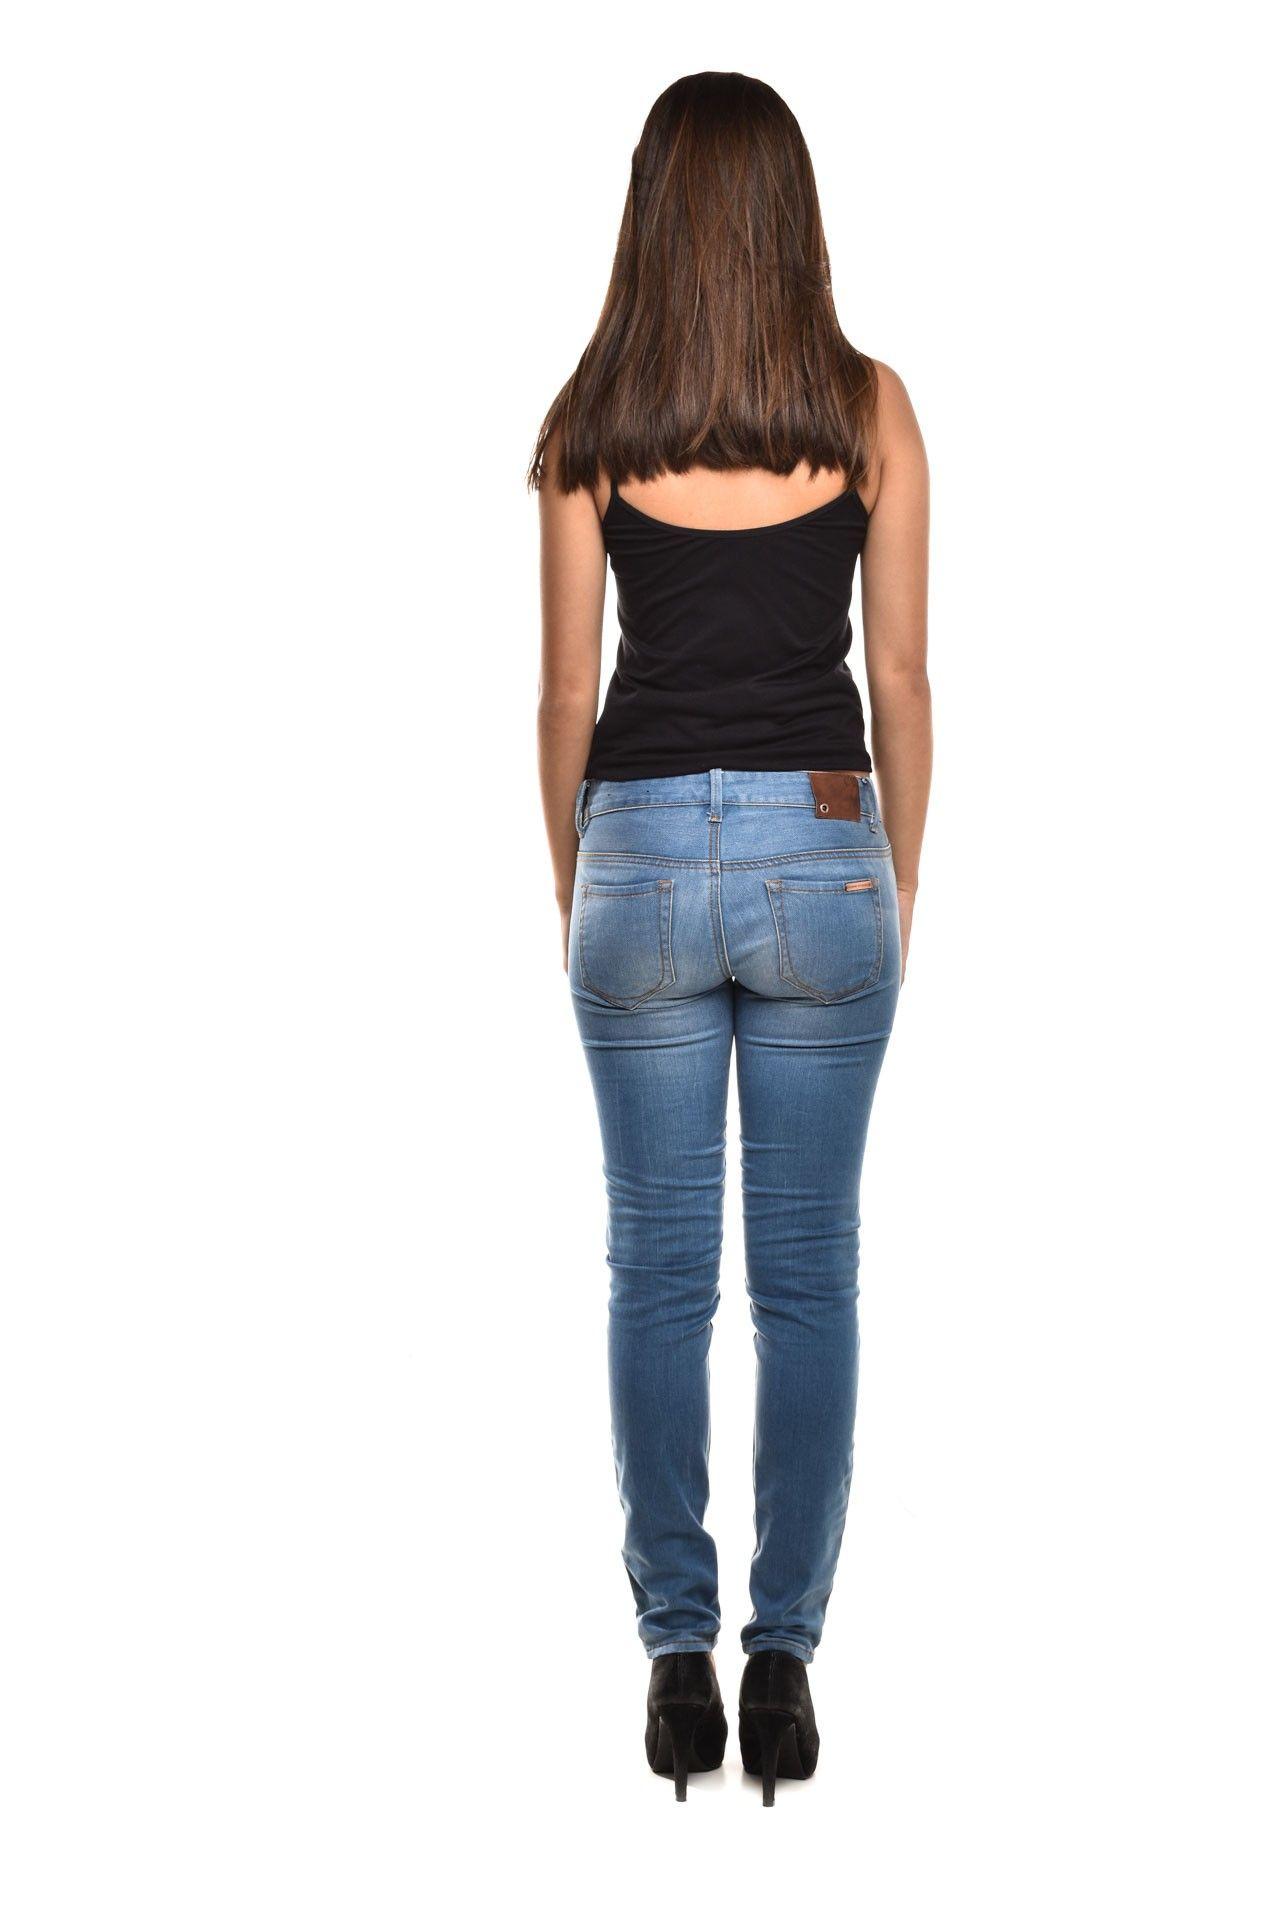 Armani Exchange - Calça Jeans Clara - Foto 4